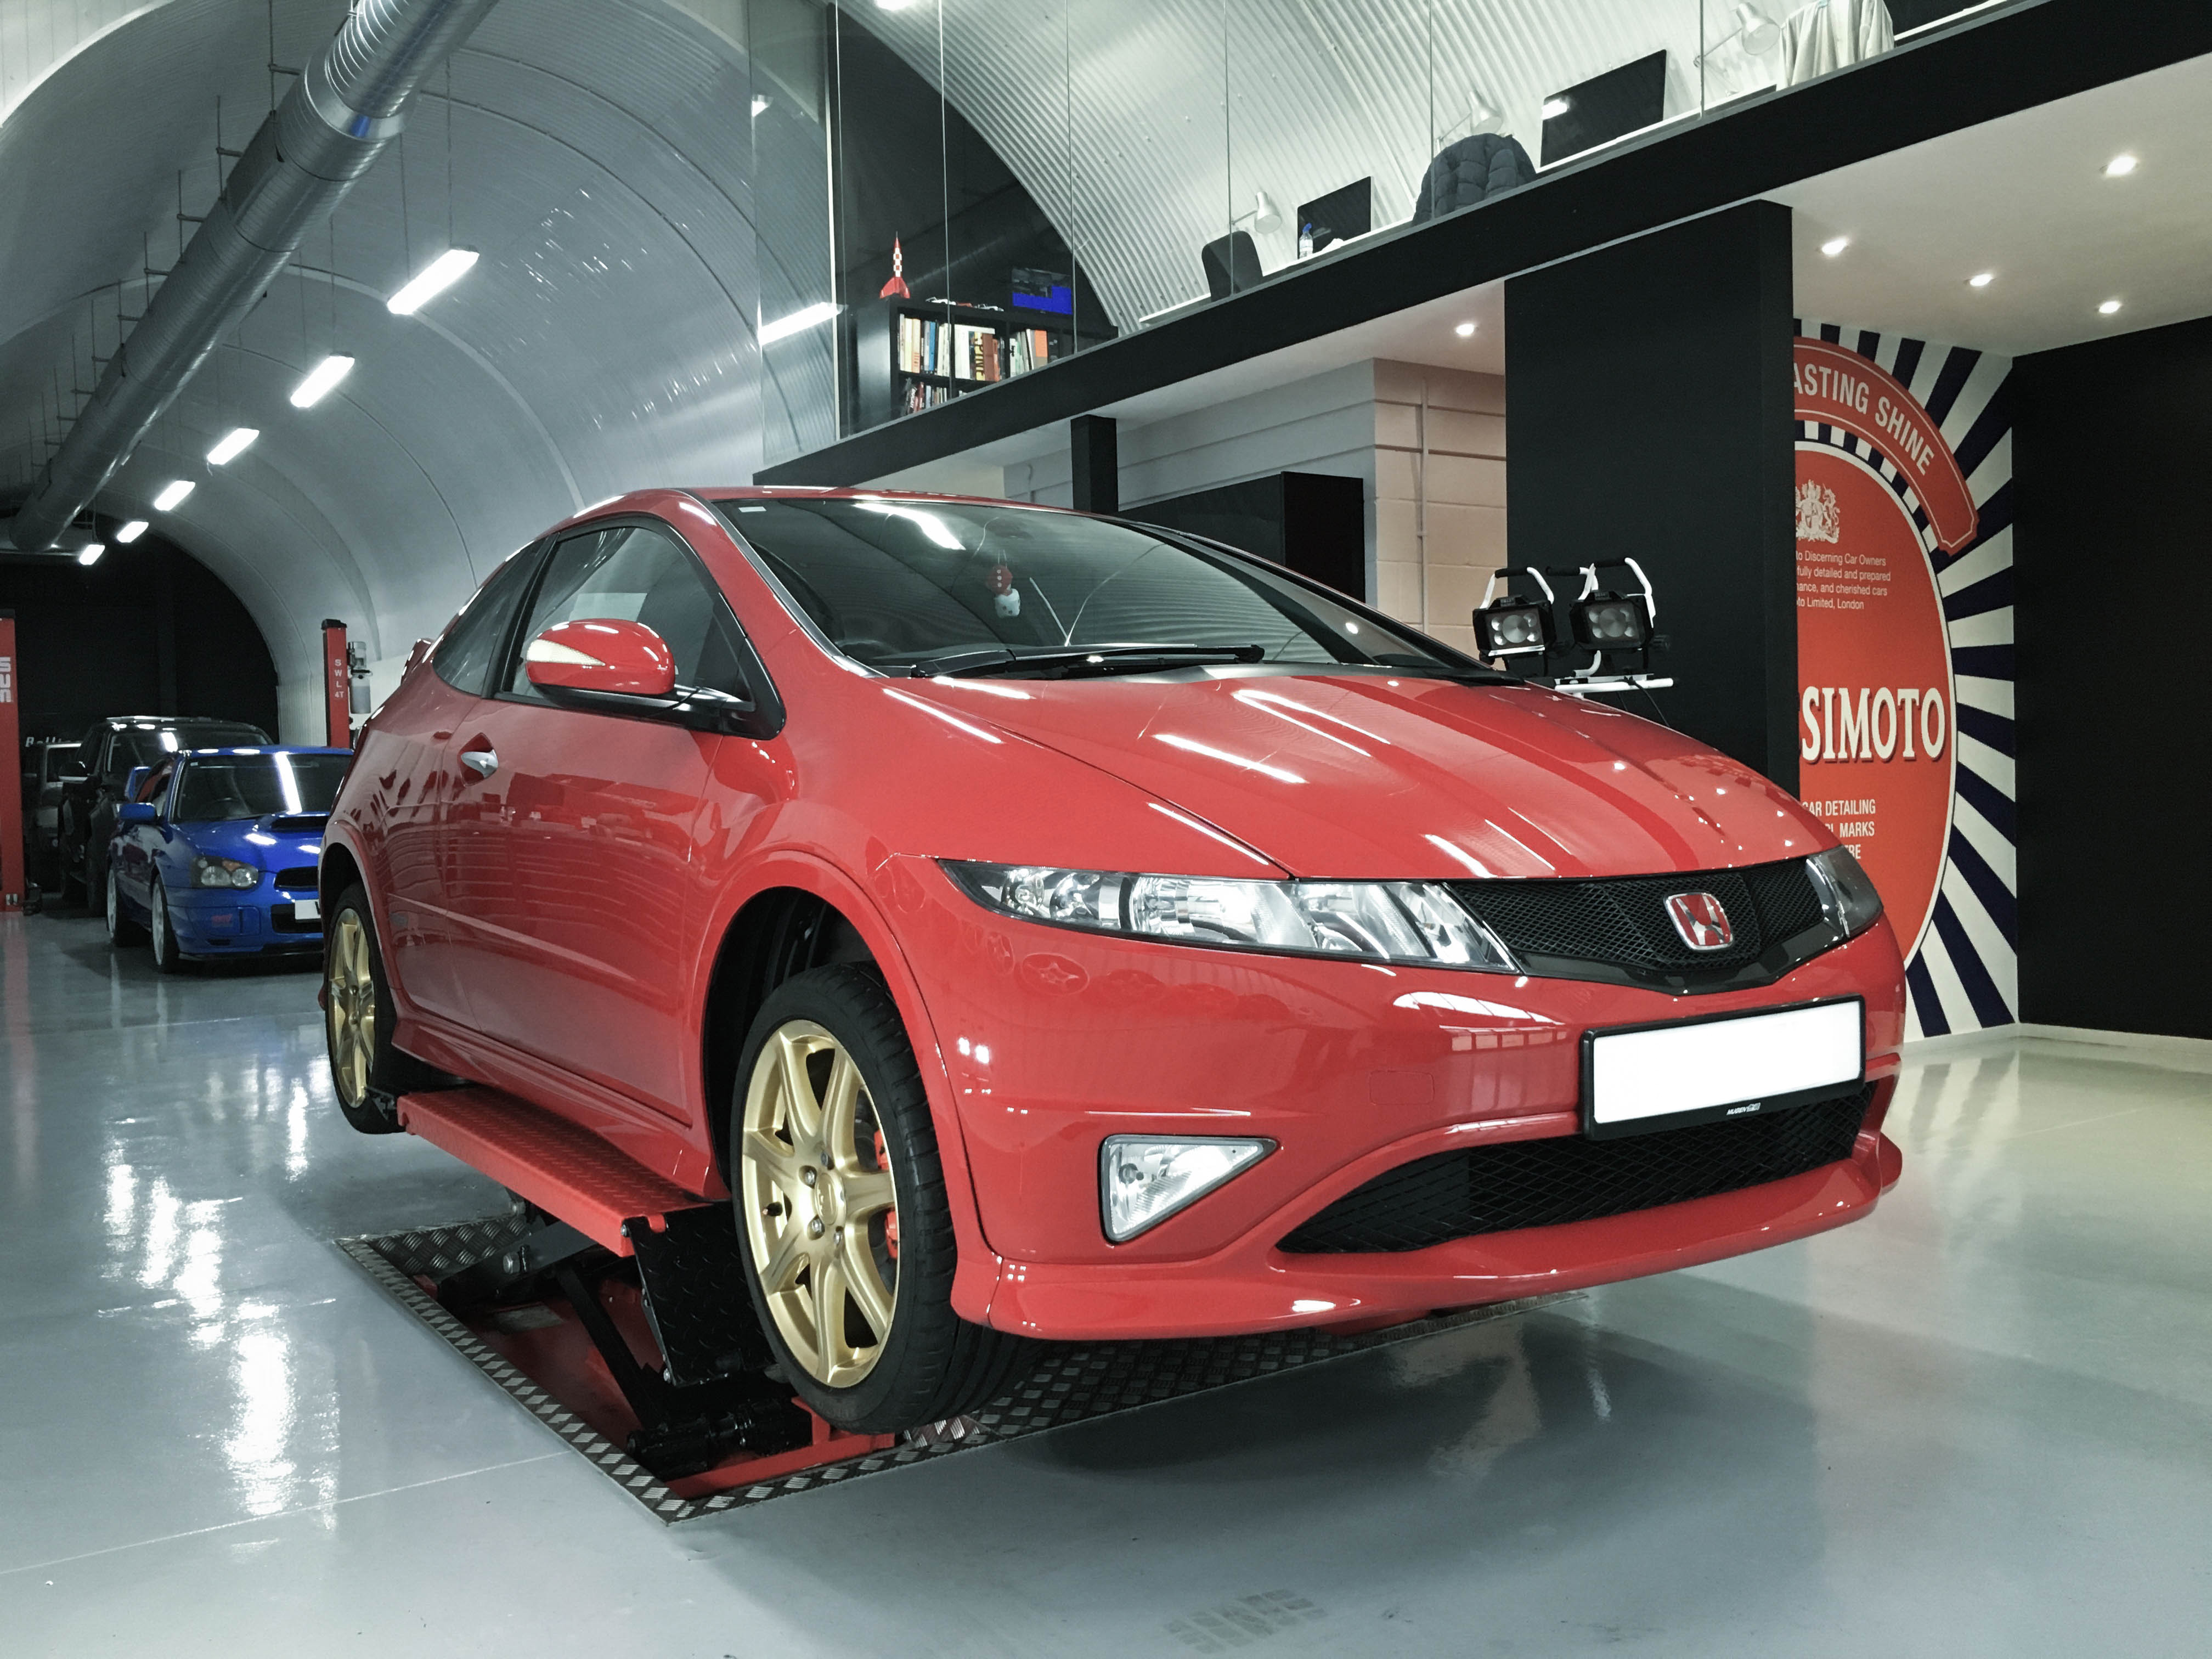 Honda Civic TypeR –On lift